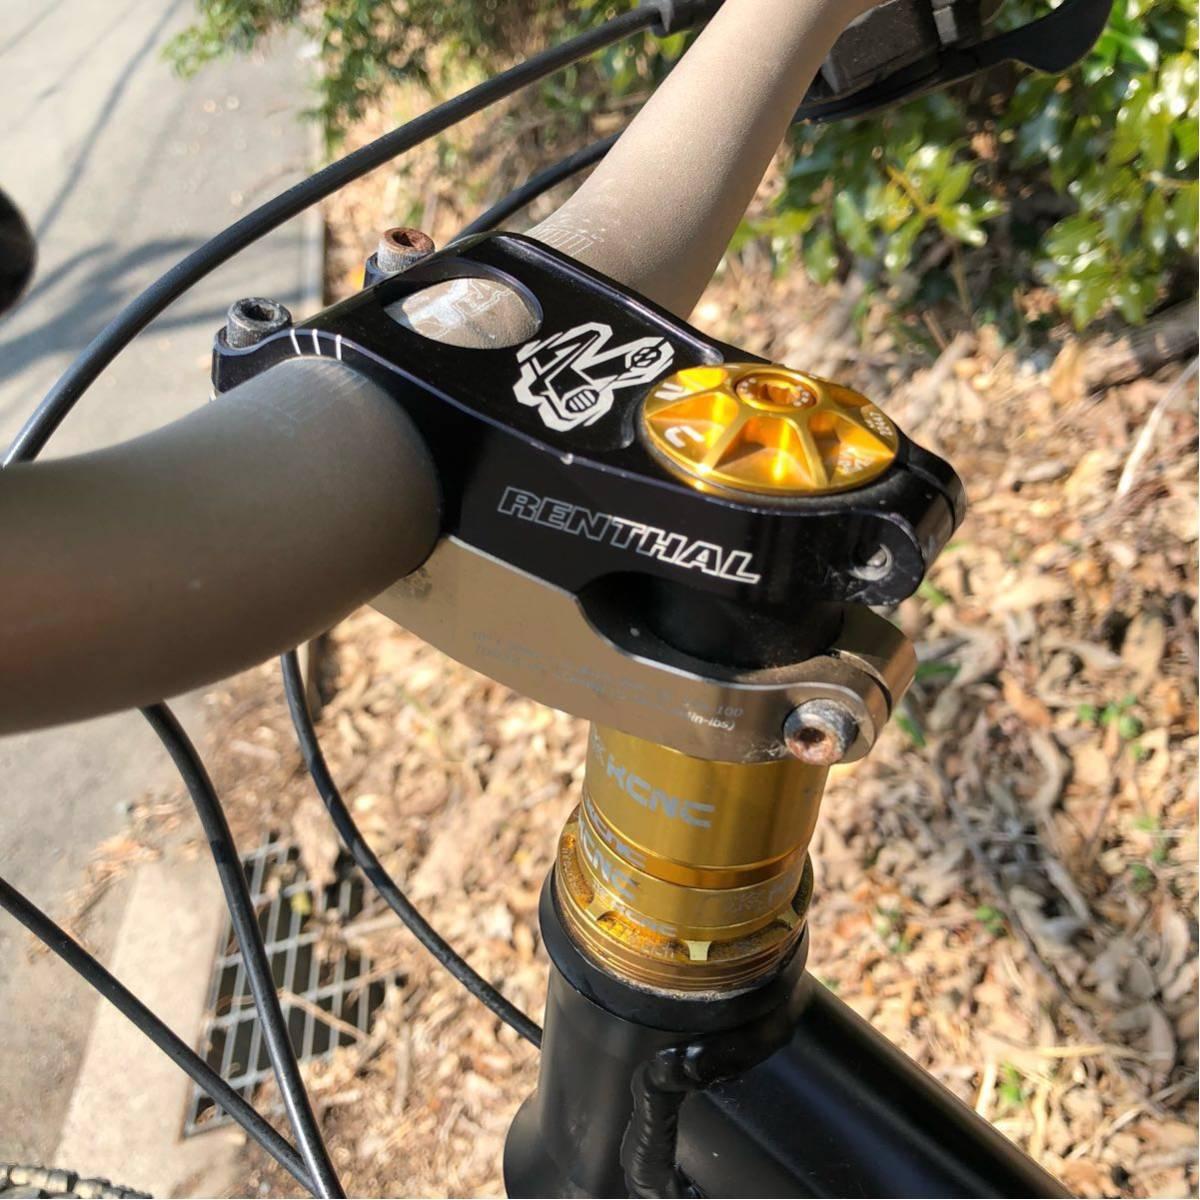 TREK GaryFisher MTB 改造多数 26 ストリート ダウンヒル トライアル BMX マウンテンバイク cannondale specialized fuji giant kona _画像4